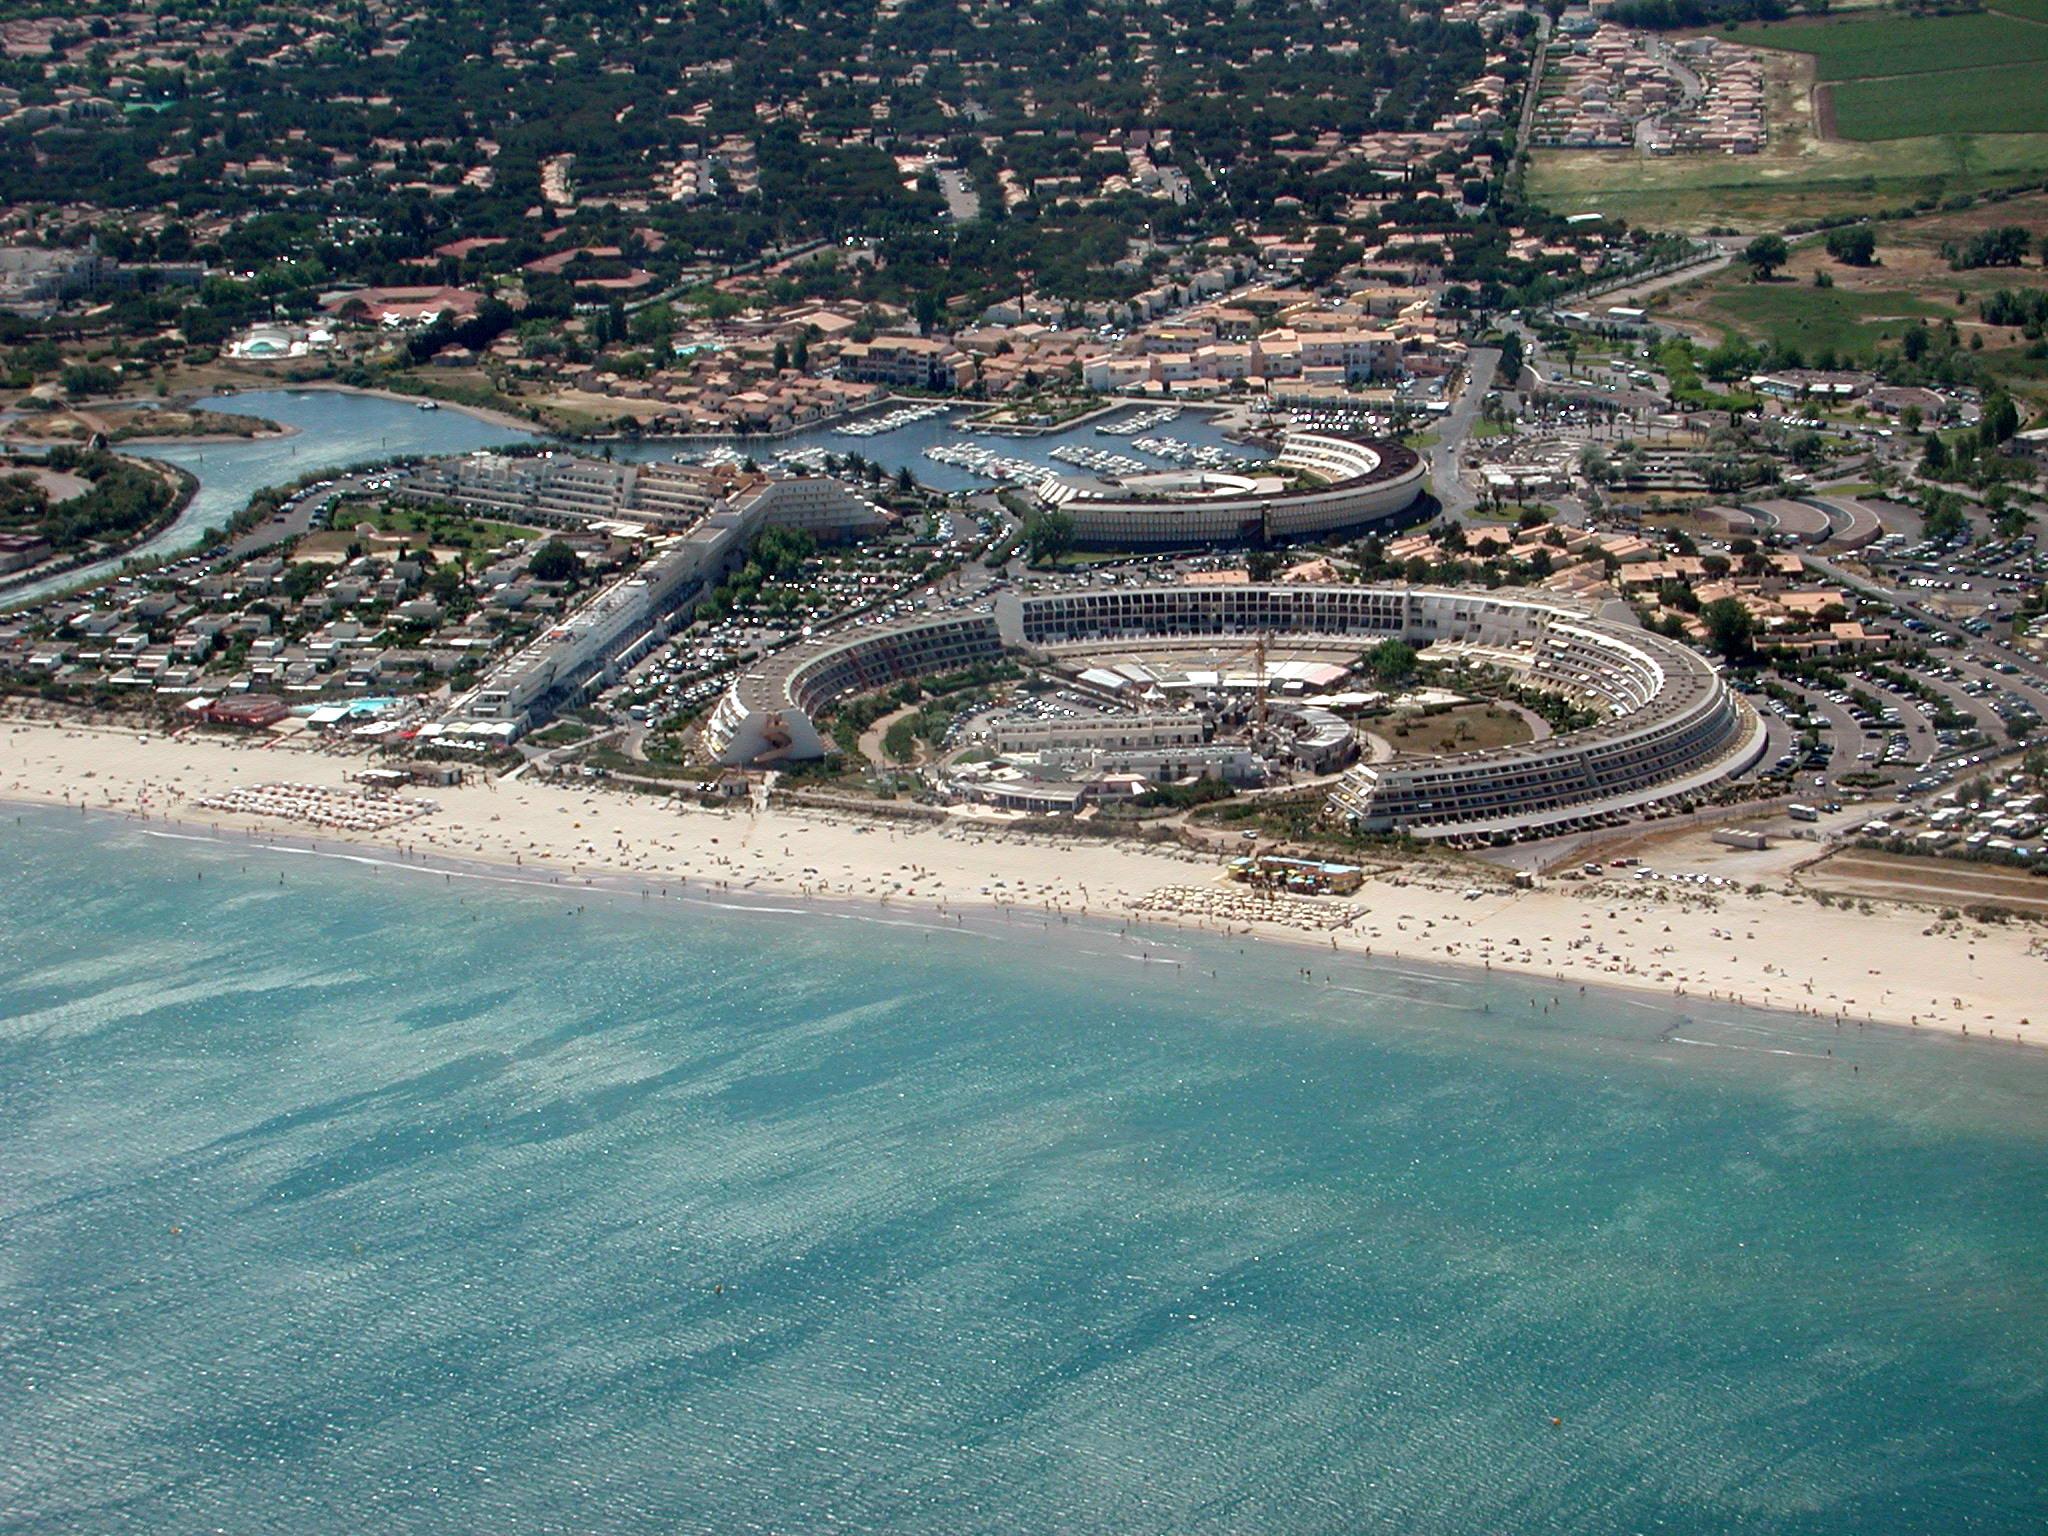 French nudist beach cap d039agde dark brown plays - 3 part 9